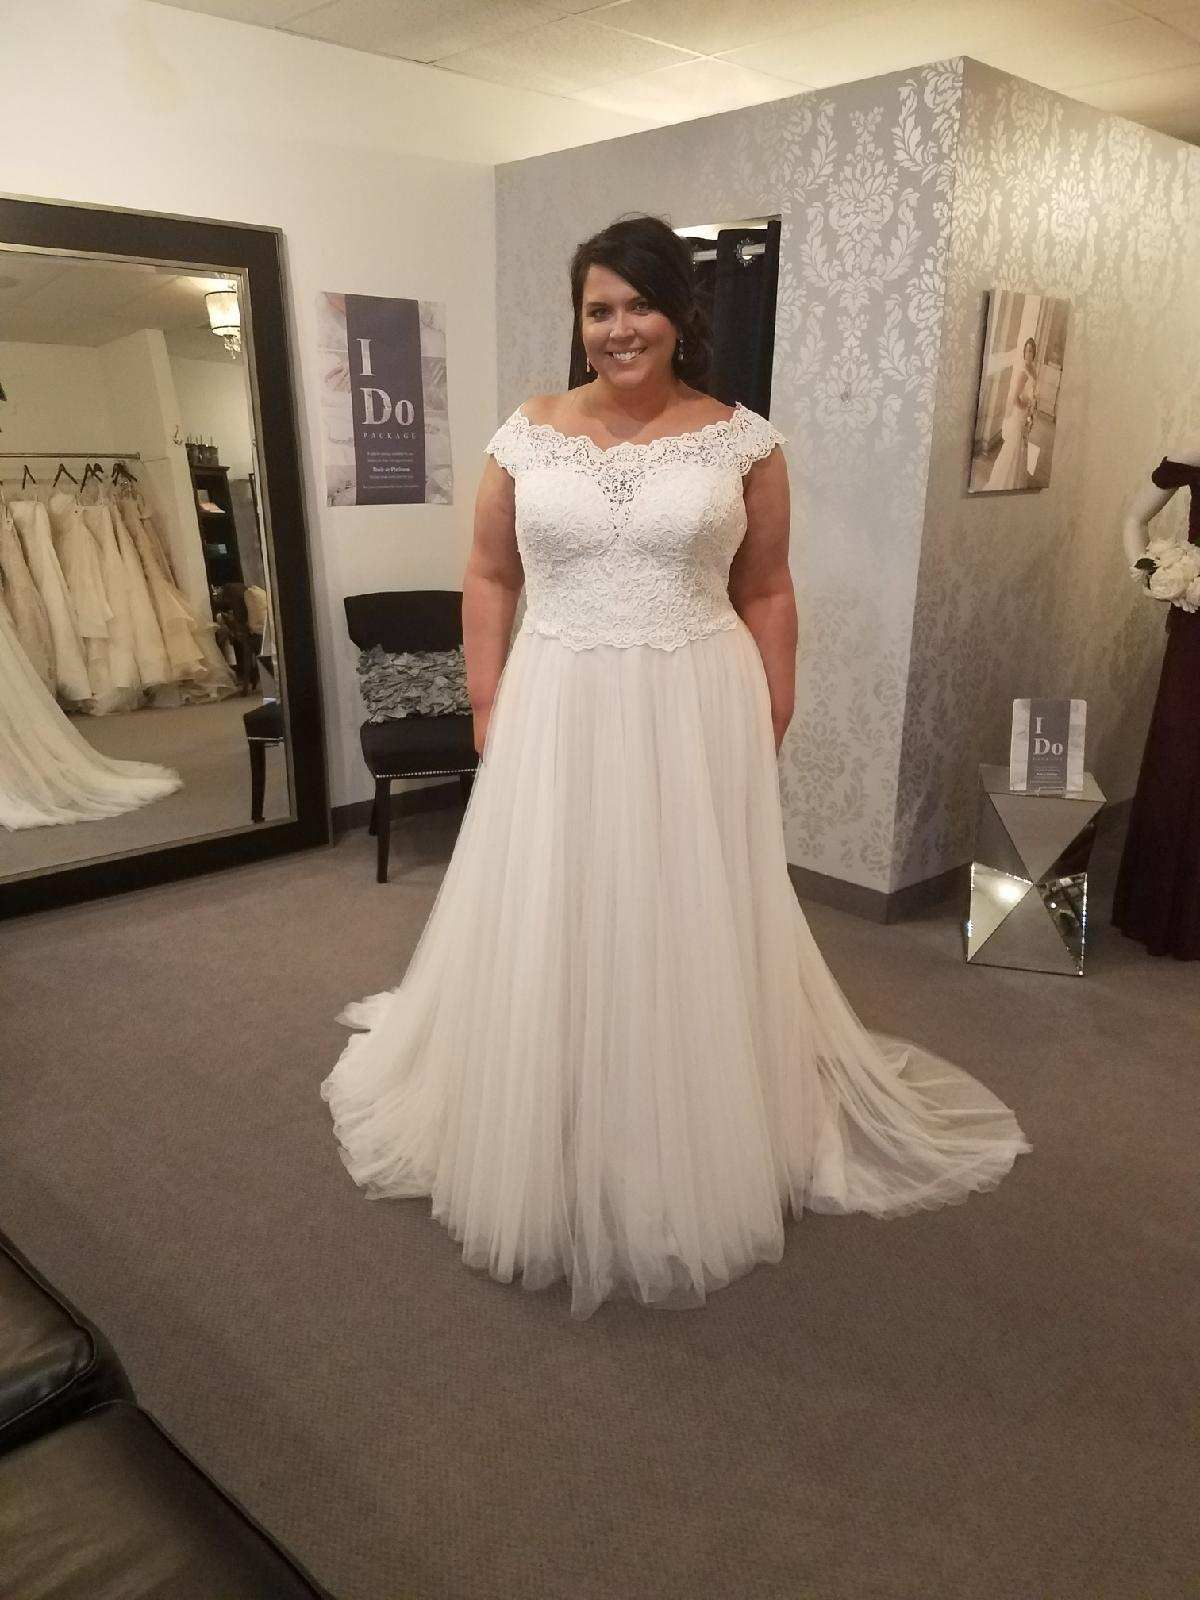 Plus Size Wedding Dress Wedding Dress Lace Off The Shoulder Wedding Gown Curvy Bride Plus Size Wedding Gowns Wedding Gown Accessories Plus Size Wedding [ 1600 x 1200 Pixel ]